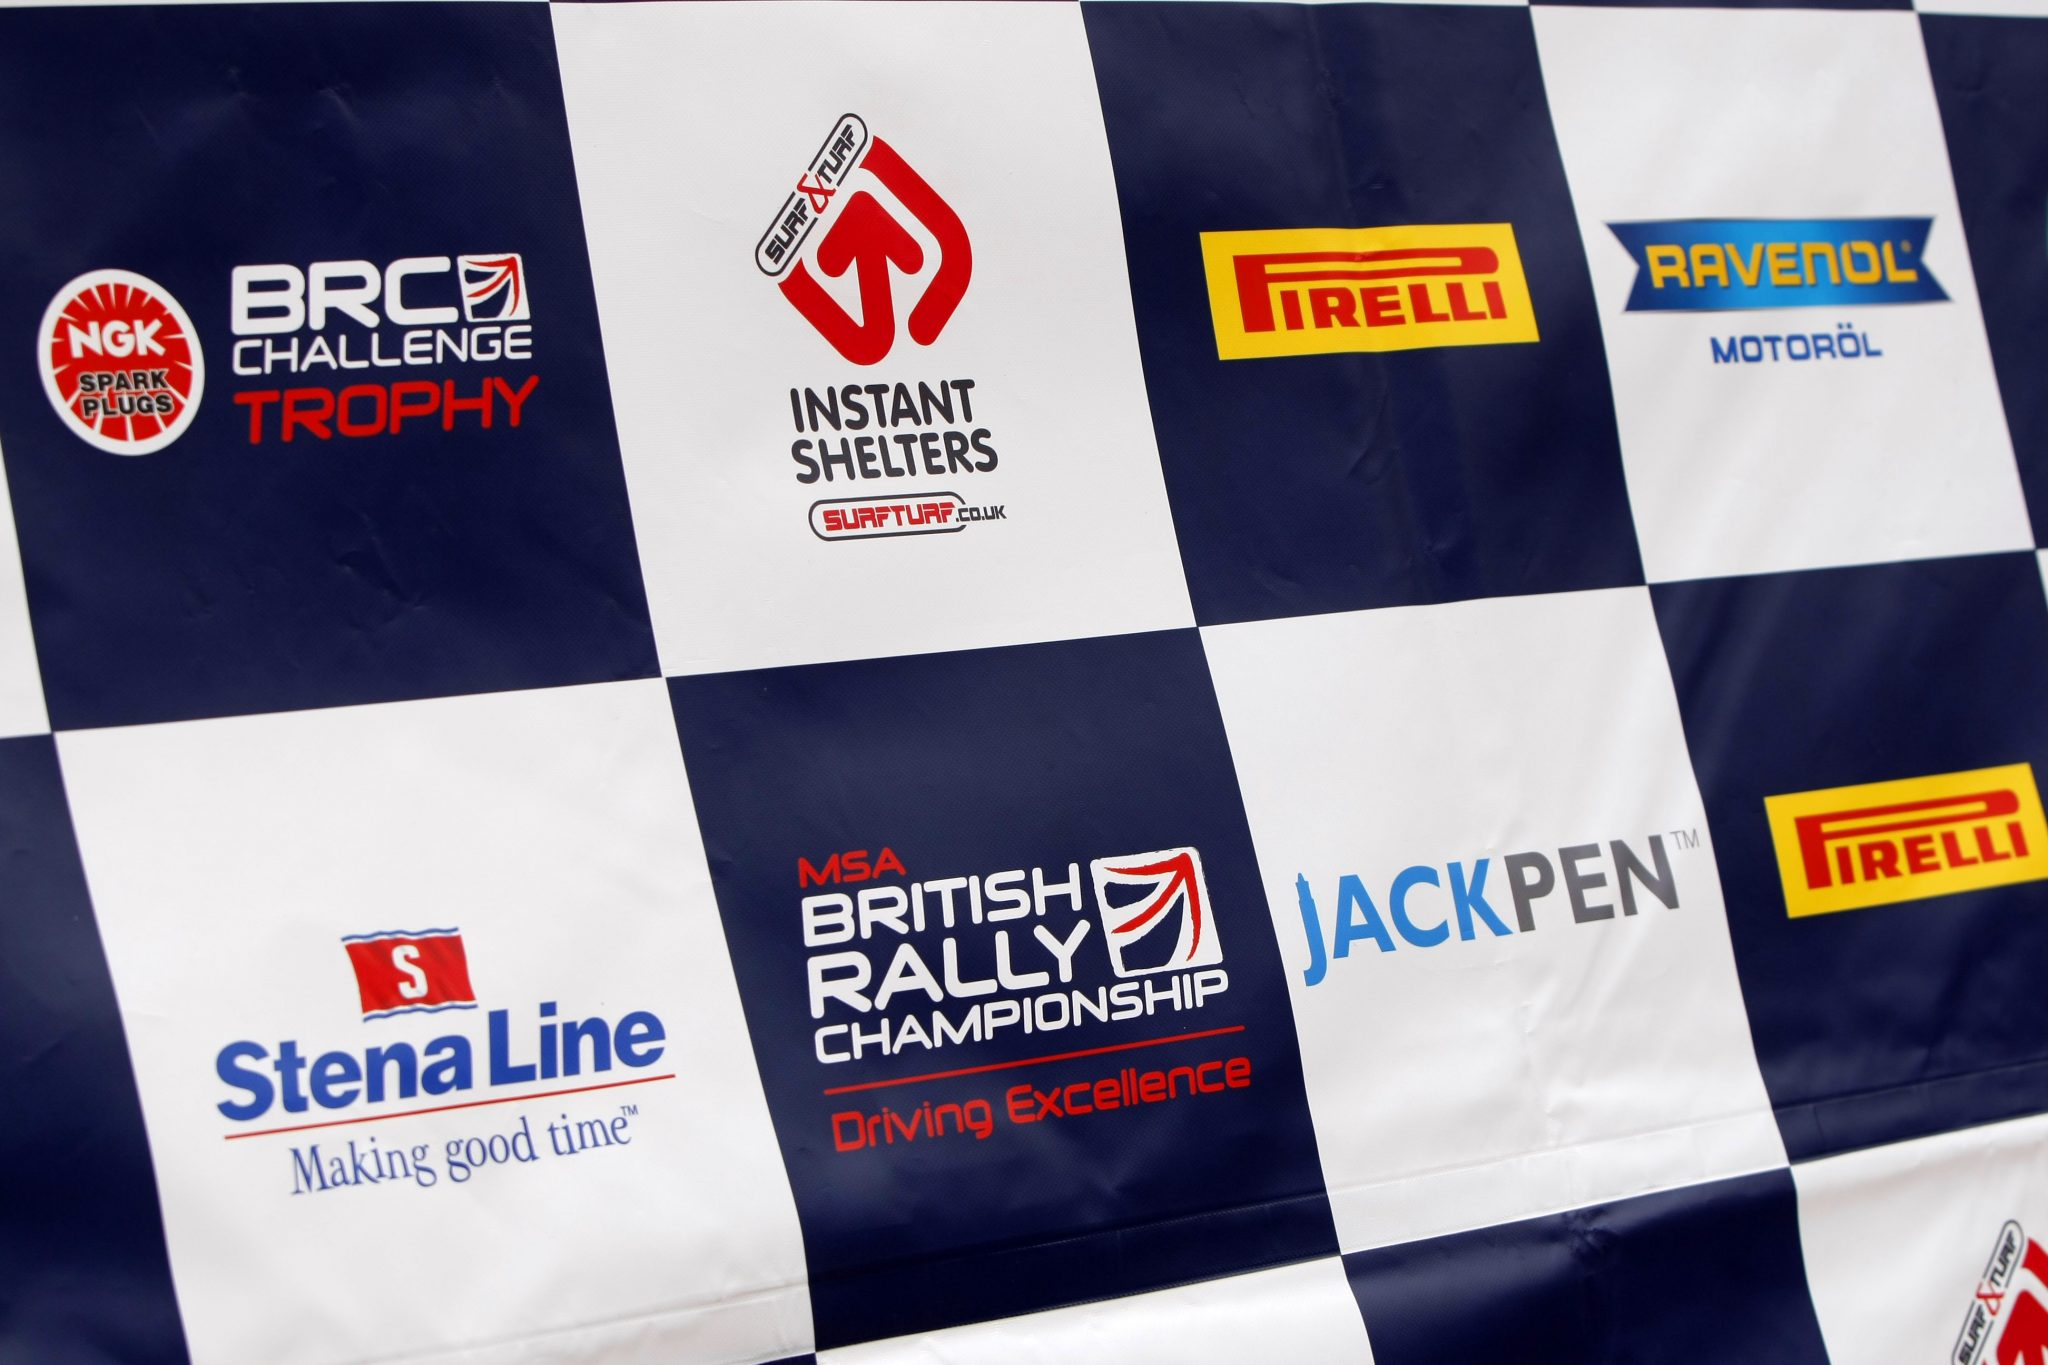 3006, 3006, BRC Sponsors, Sponsors-01.jpg, 257863, https://surfturf.co.uk/wp-content/uploads/2018/06/Sponsors-01.jpg, https://surfturf.co.uk/case-studies/british-rally/attachment/brc-sponsors-2/, , 3, , BRC Sponsors, brc-sponsors-2, inherit, 849, 2018-11-28 14:23:06, 2018-11-28 14:23:06, 0, image/jpeg, image, jpeg, https://surfturf.co.uk/wp-includes/images/media/default.png, 2048, 1365, Array